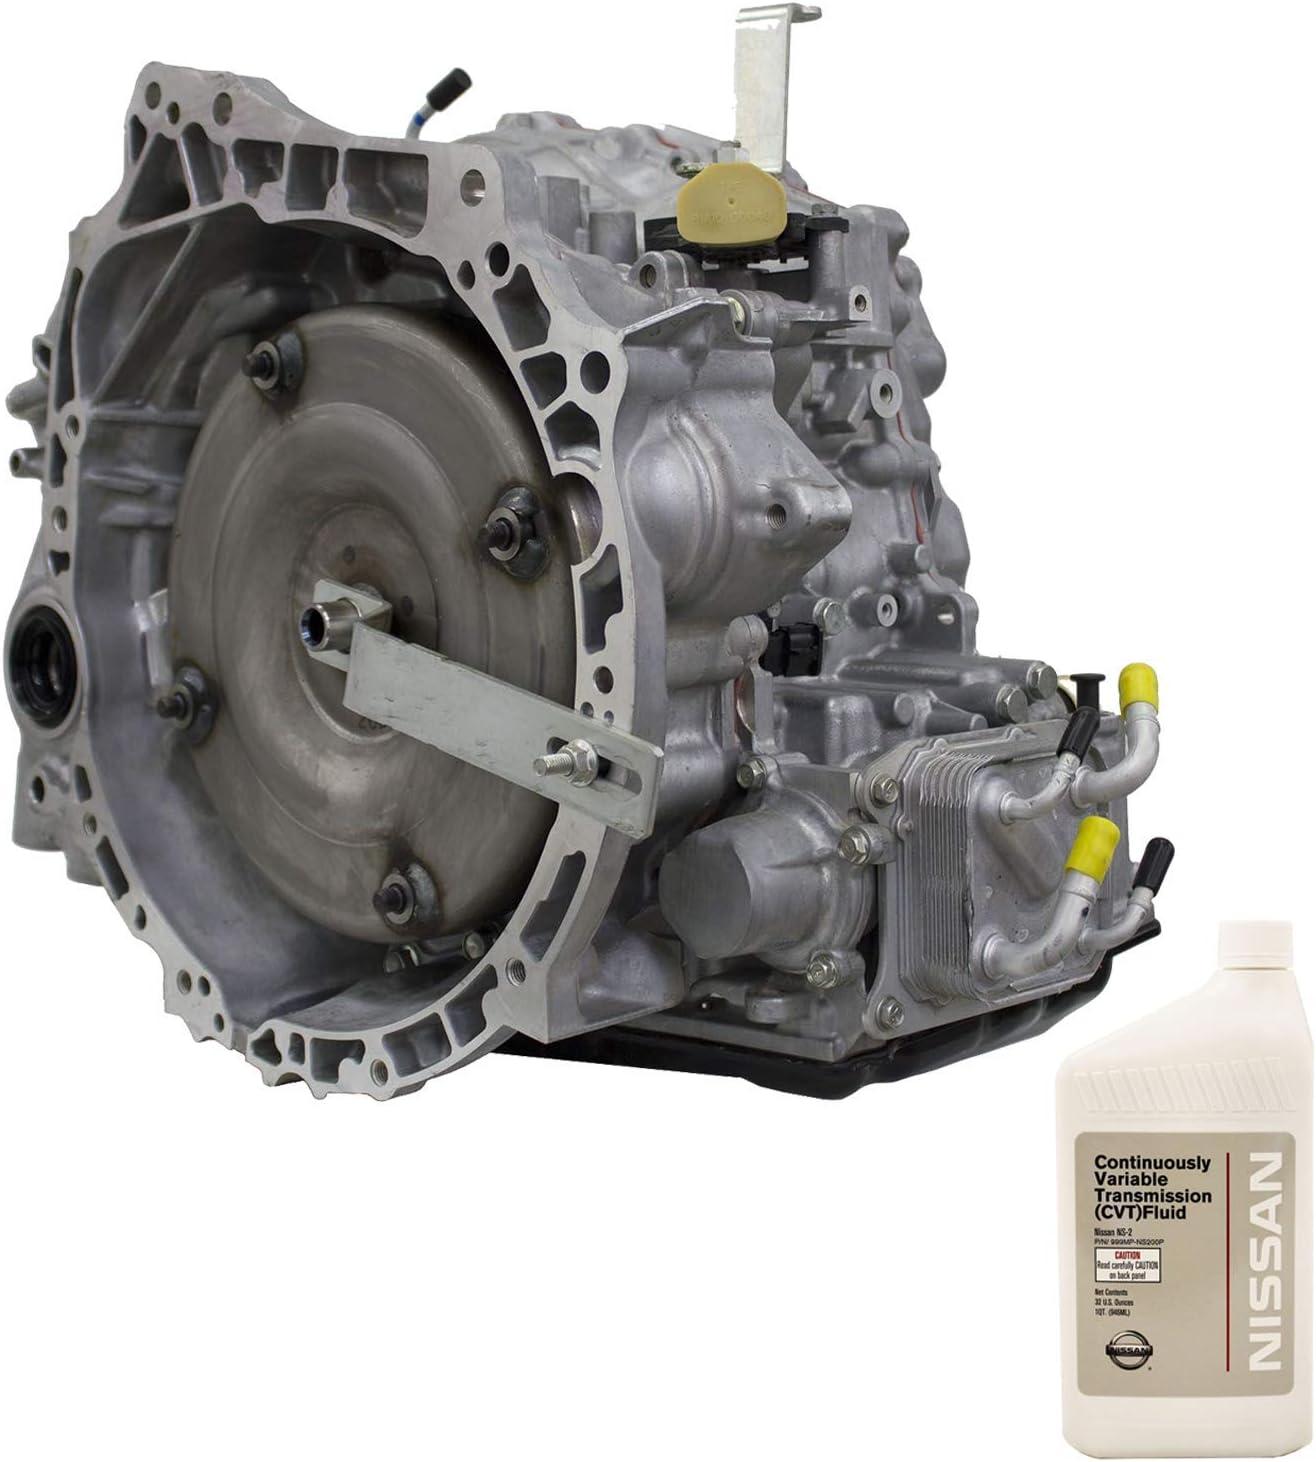 CVT 2007 Nissan Maxima 3.5L Rebuilt Transmission